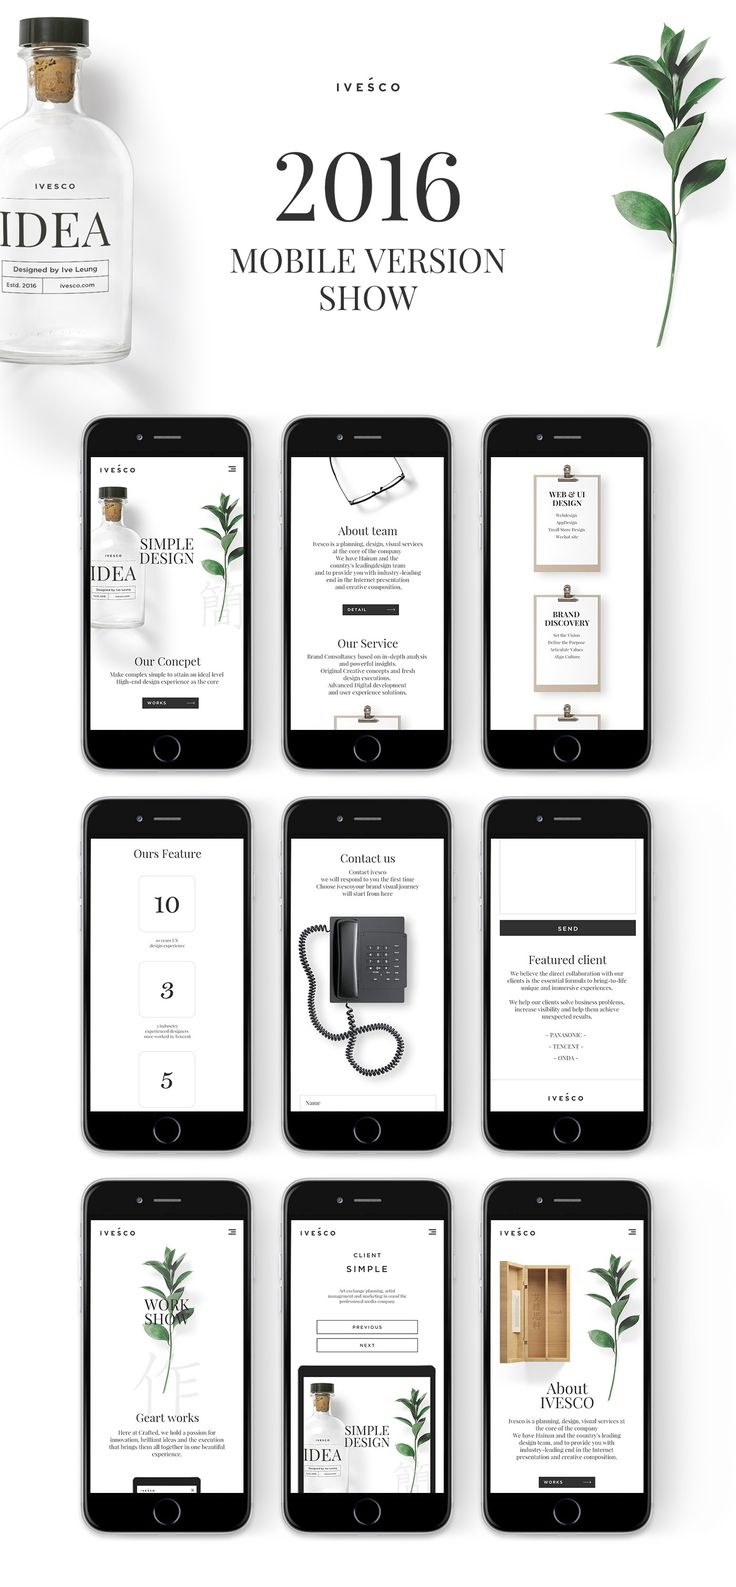 ivesco mobile version 2016